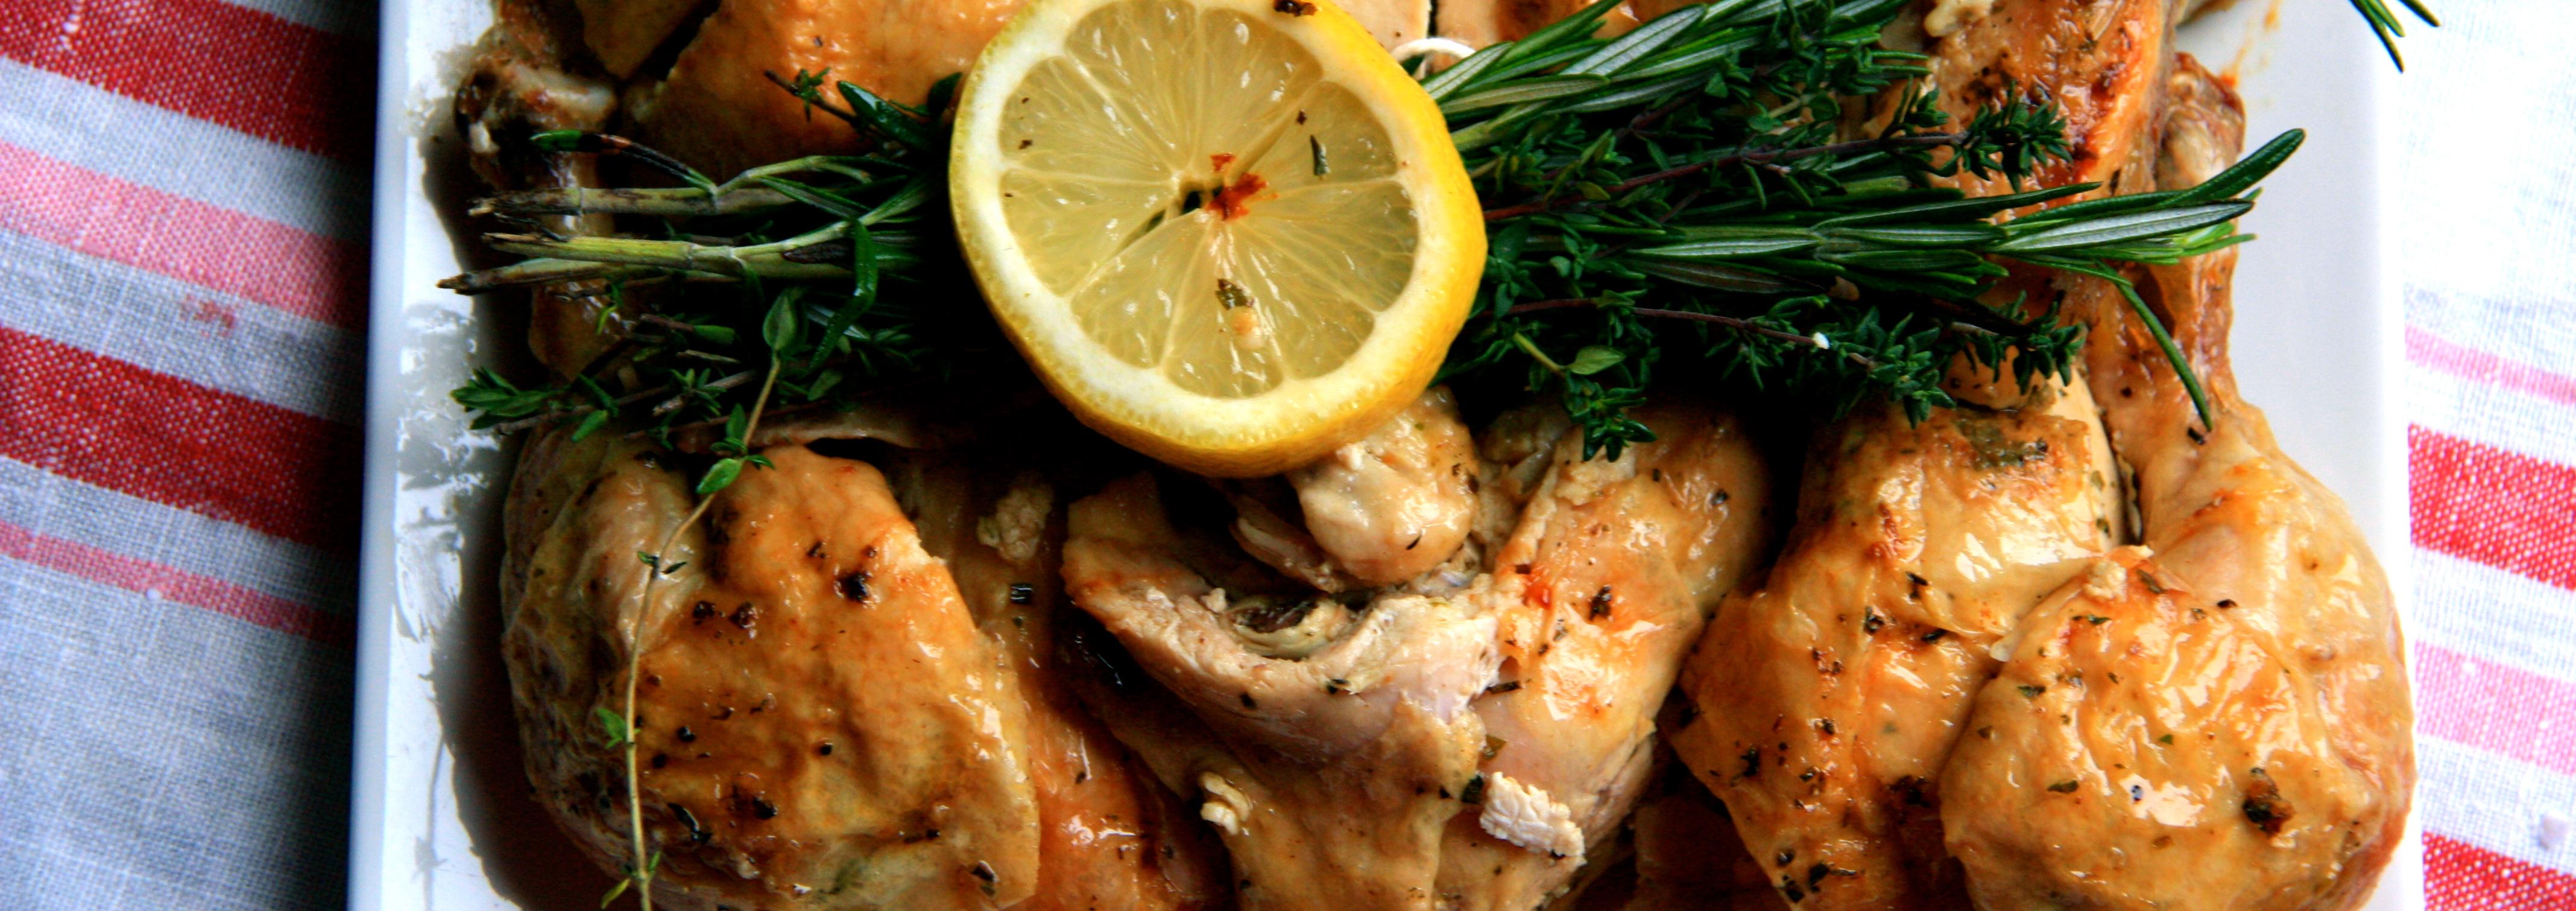 Herb and Lemon Roast Chicken